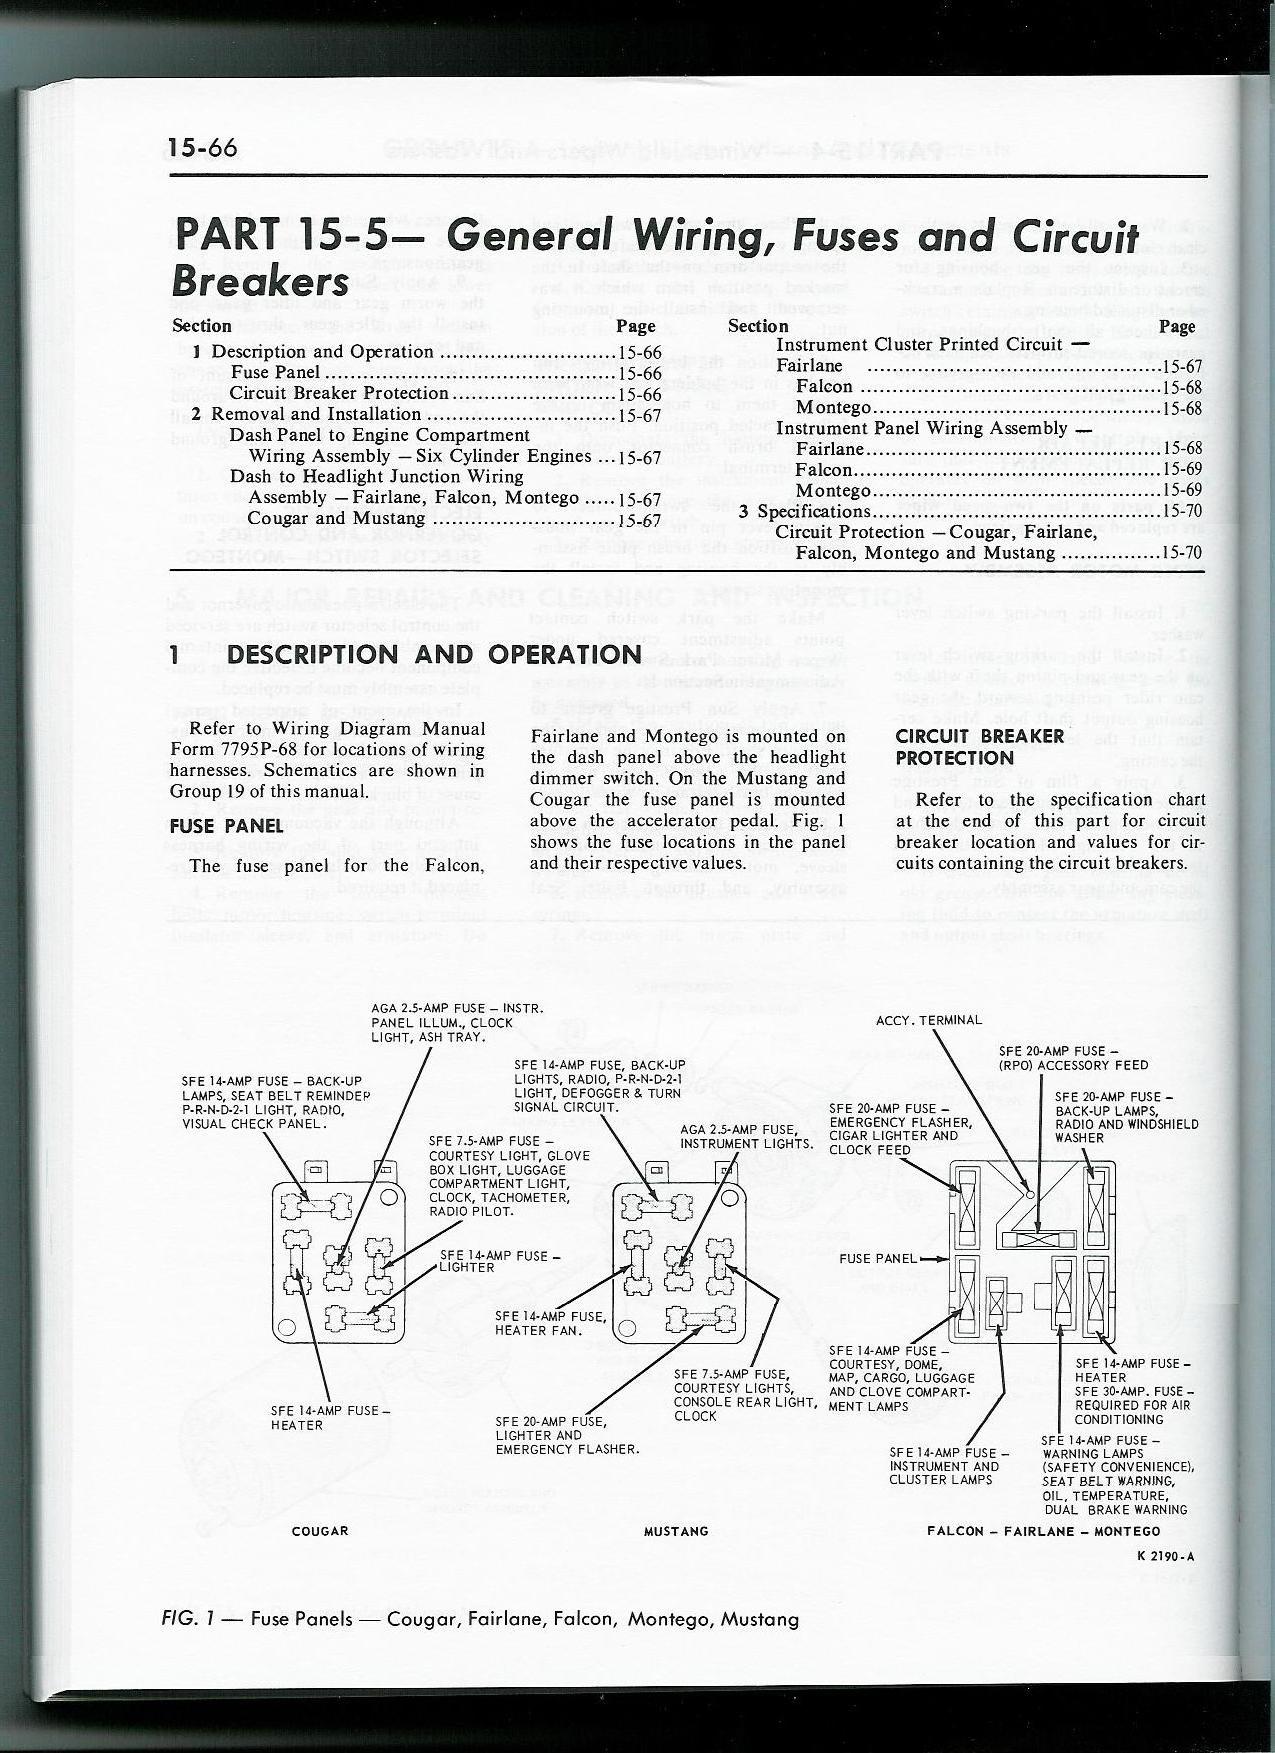 1965 mustang gt wiring diagram 2005 chevy cobalt radio fuse box data